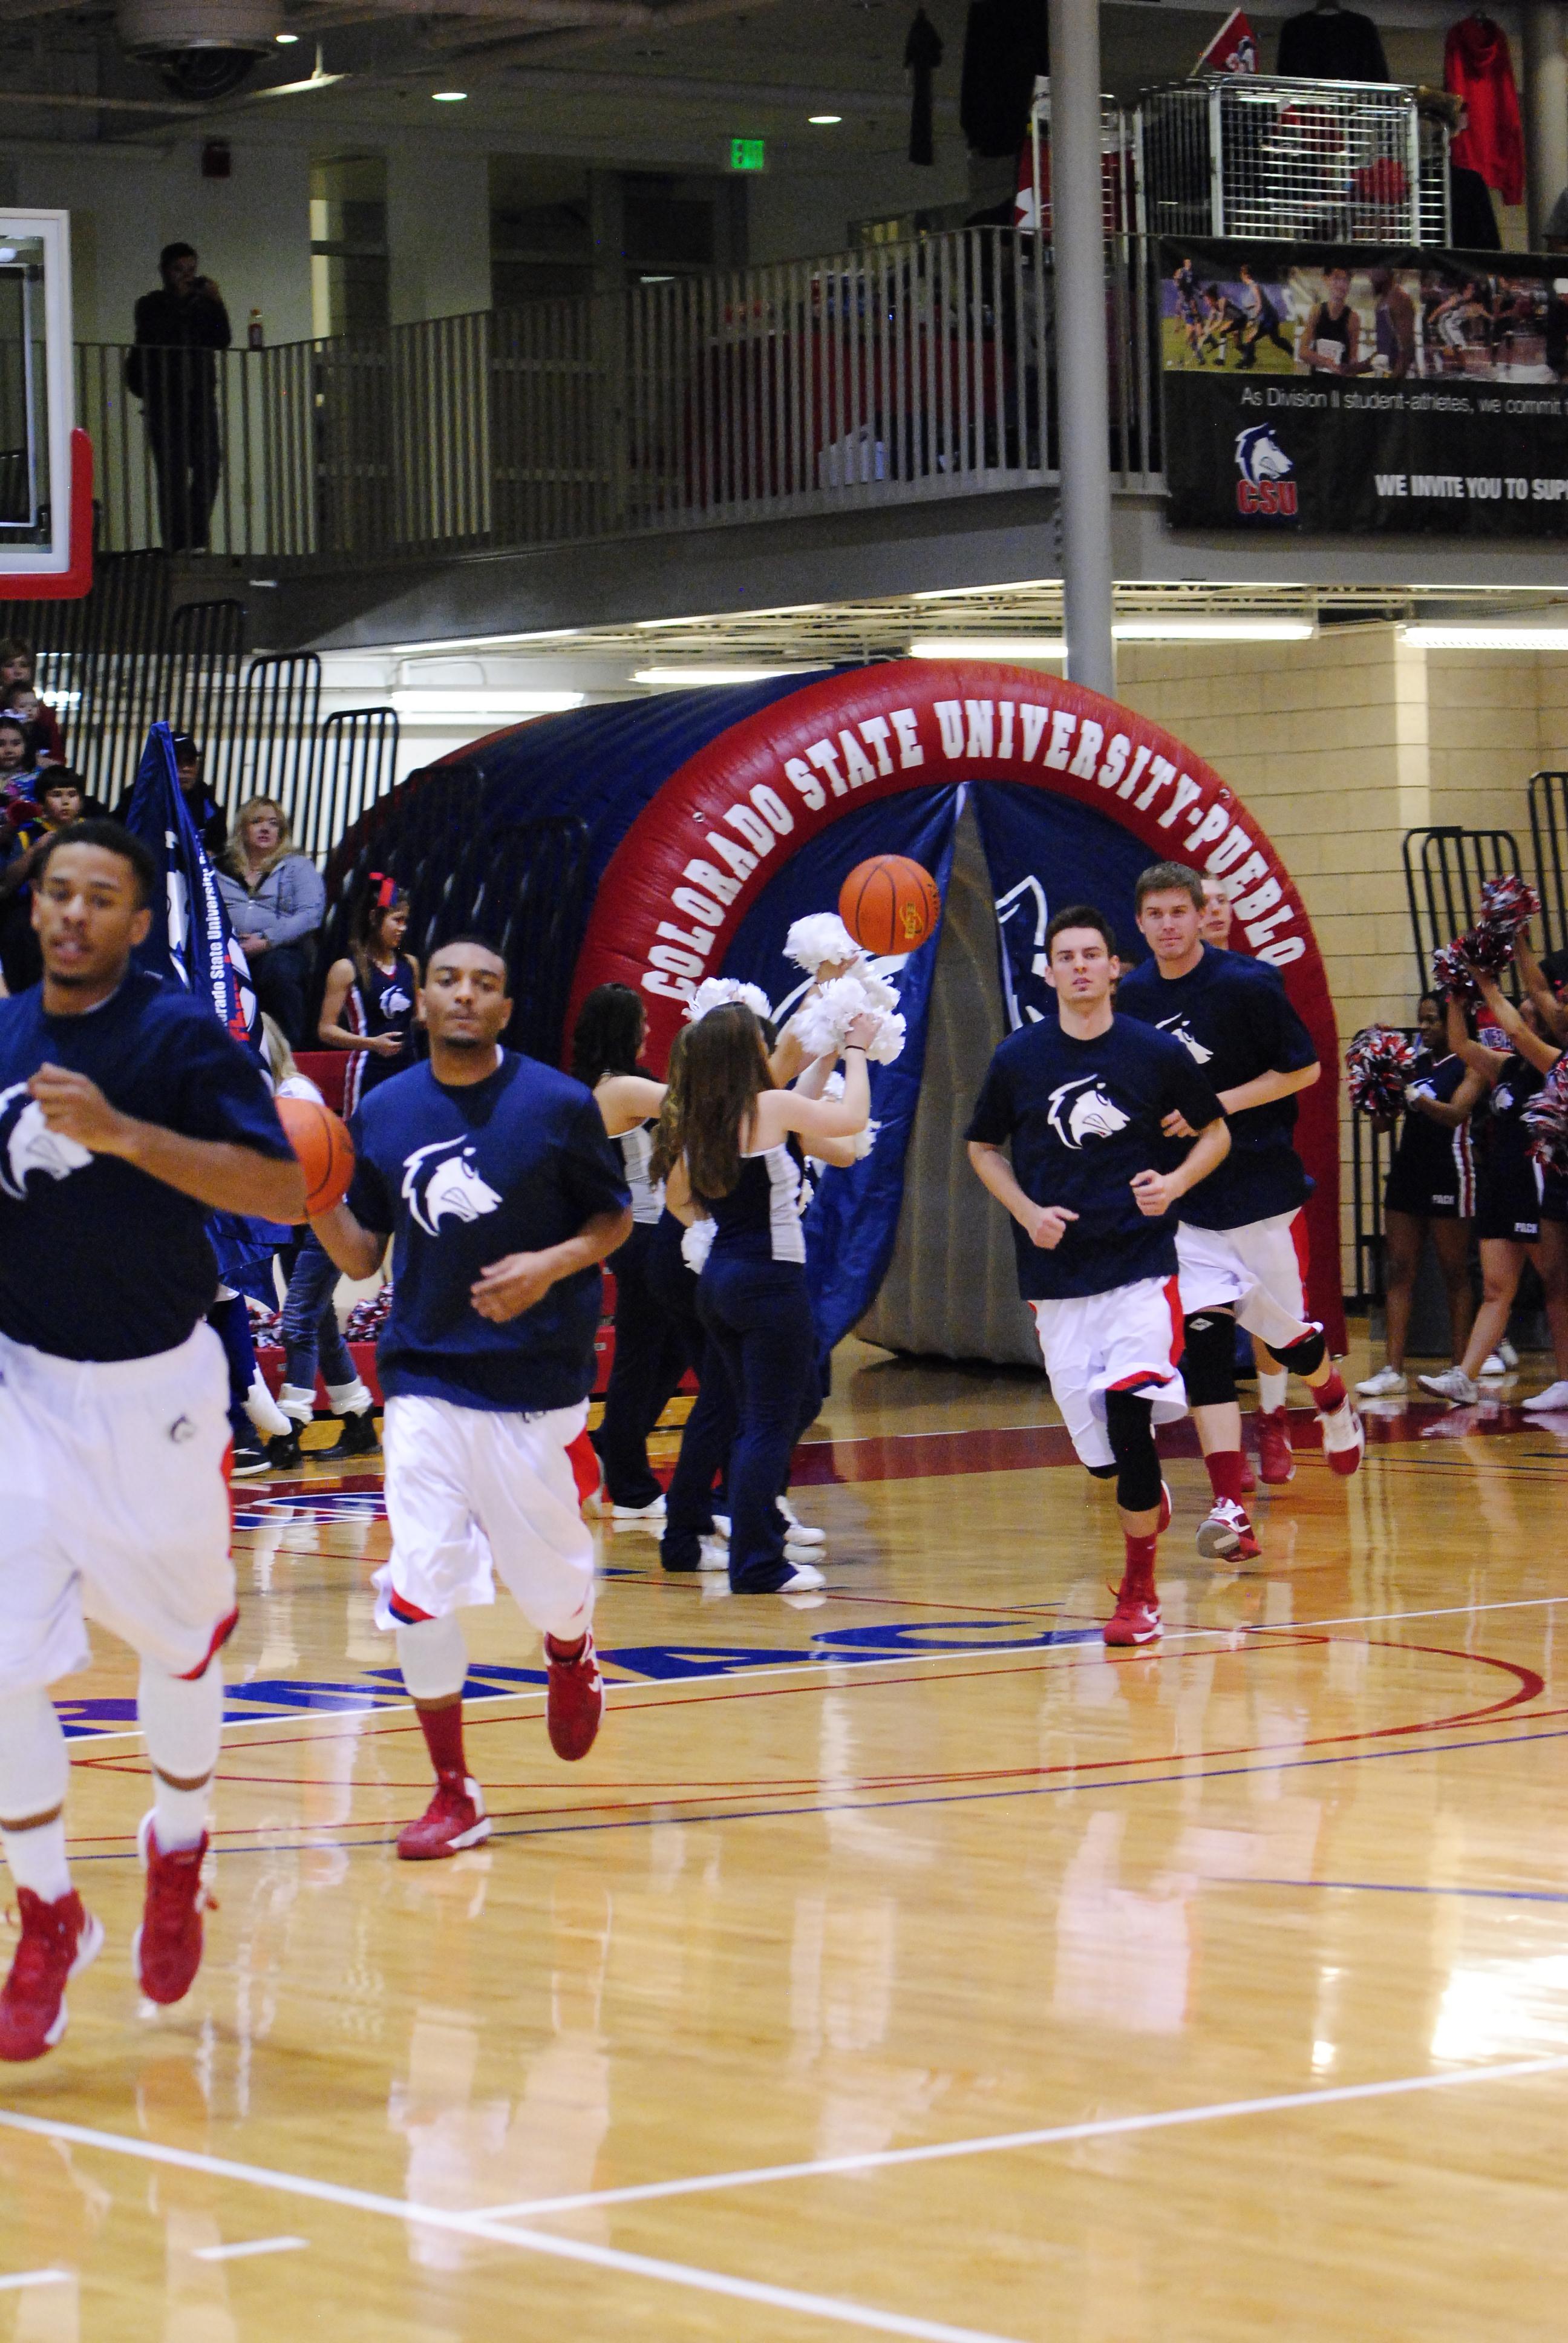 CSU-Pueblo men's basketball team runs out on to the court. Photo courtesy of Tyler Shomaker